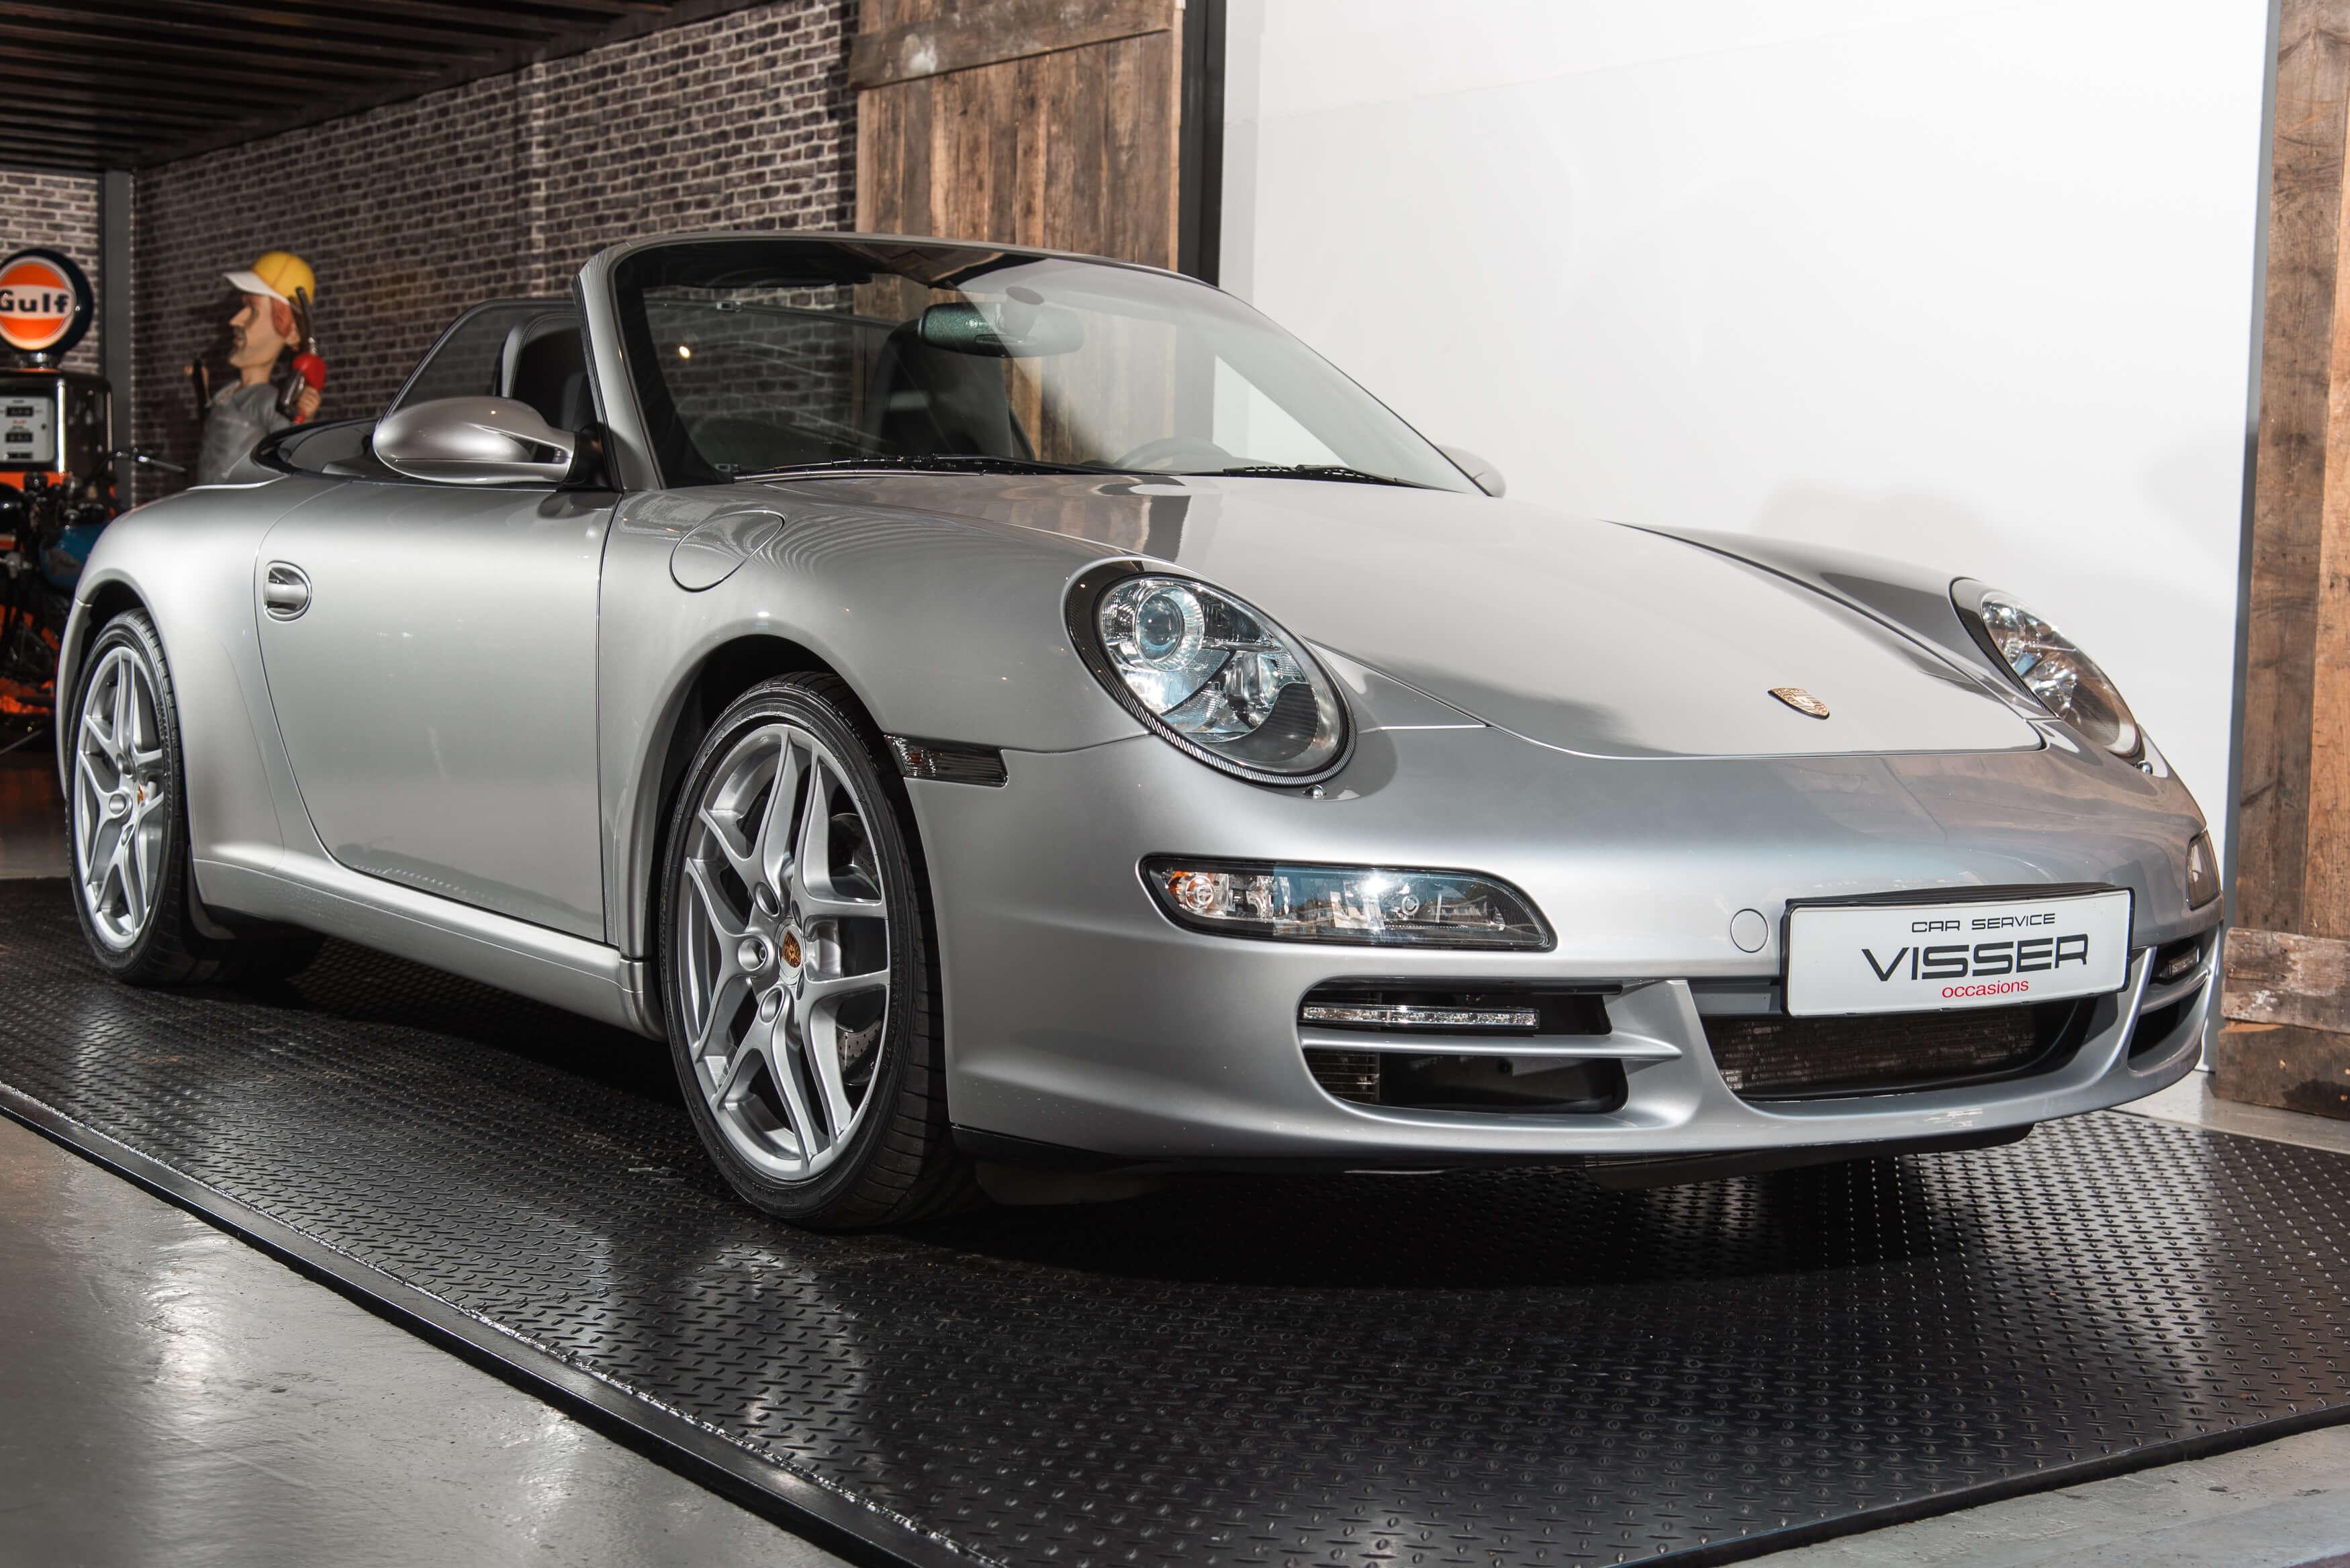 Porsche 997 Carrera 2 automaat Car Service Visser gespecialiseerd in Porsche - 7